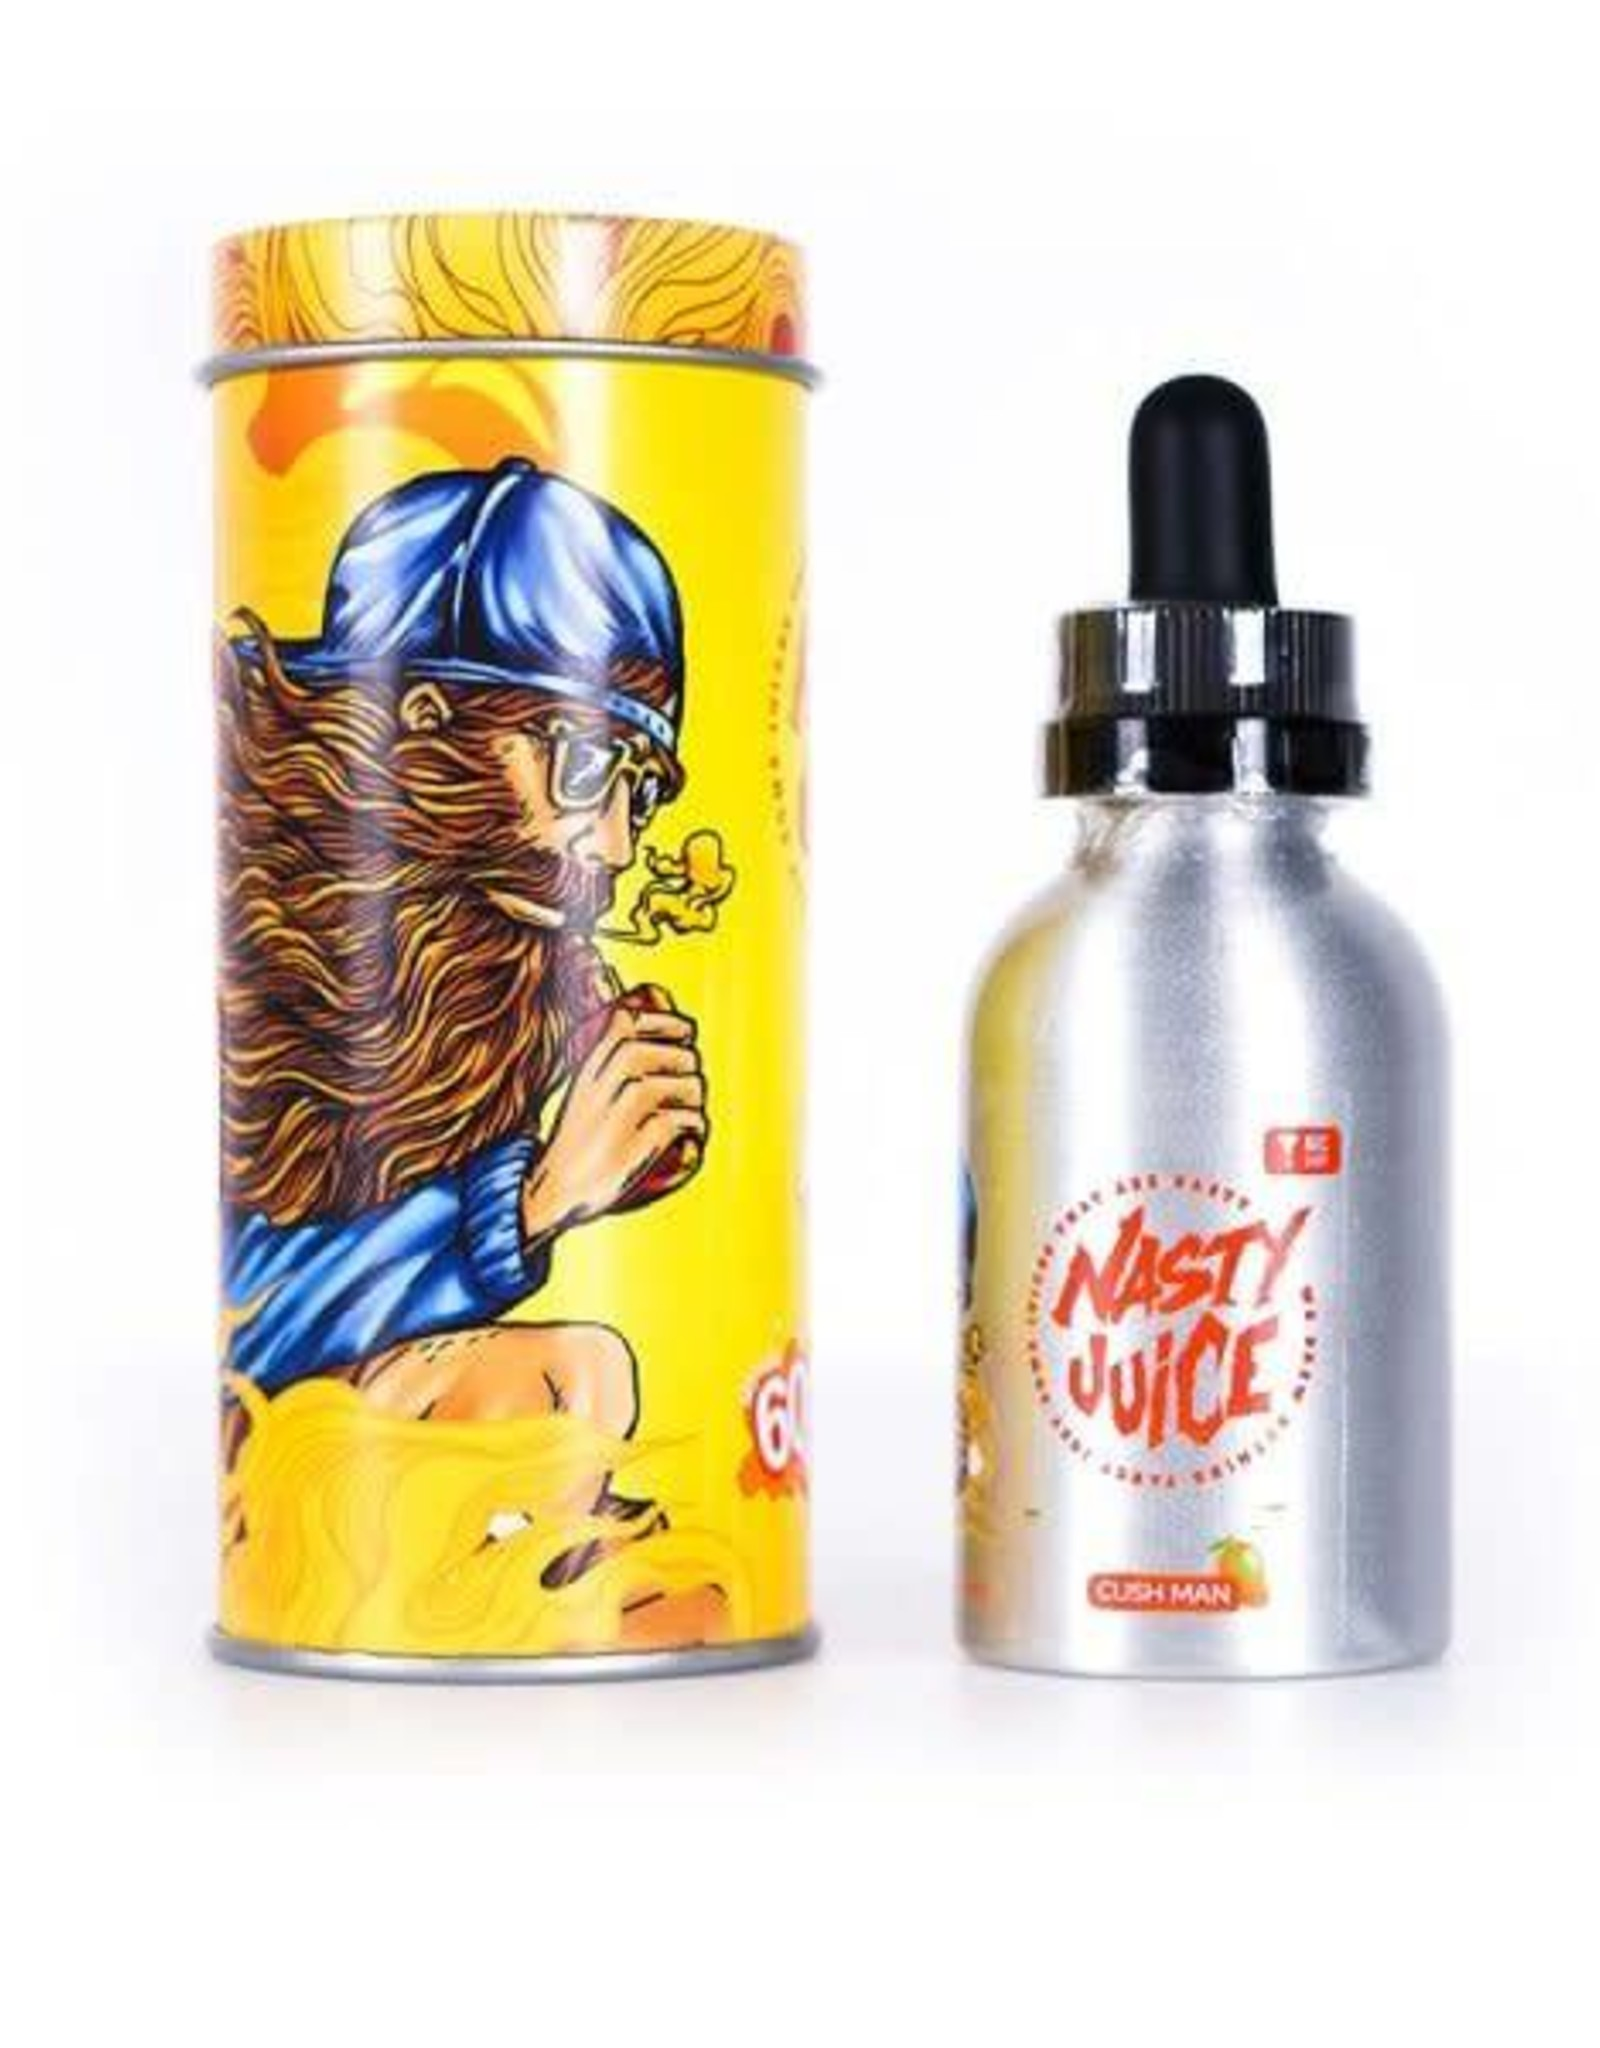 Nasty Juice Nasty Juice - Cush Man (Low Mint) (60mL)